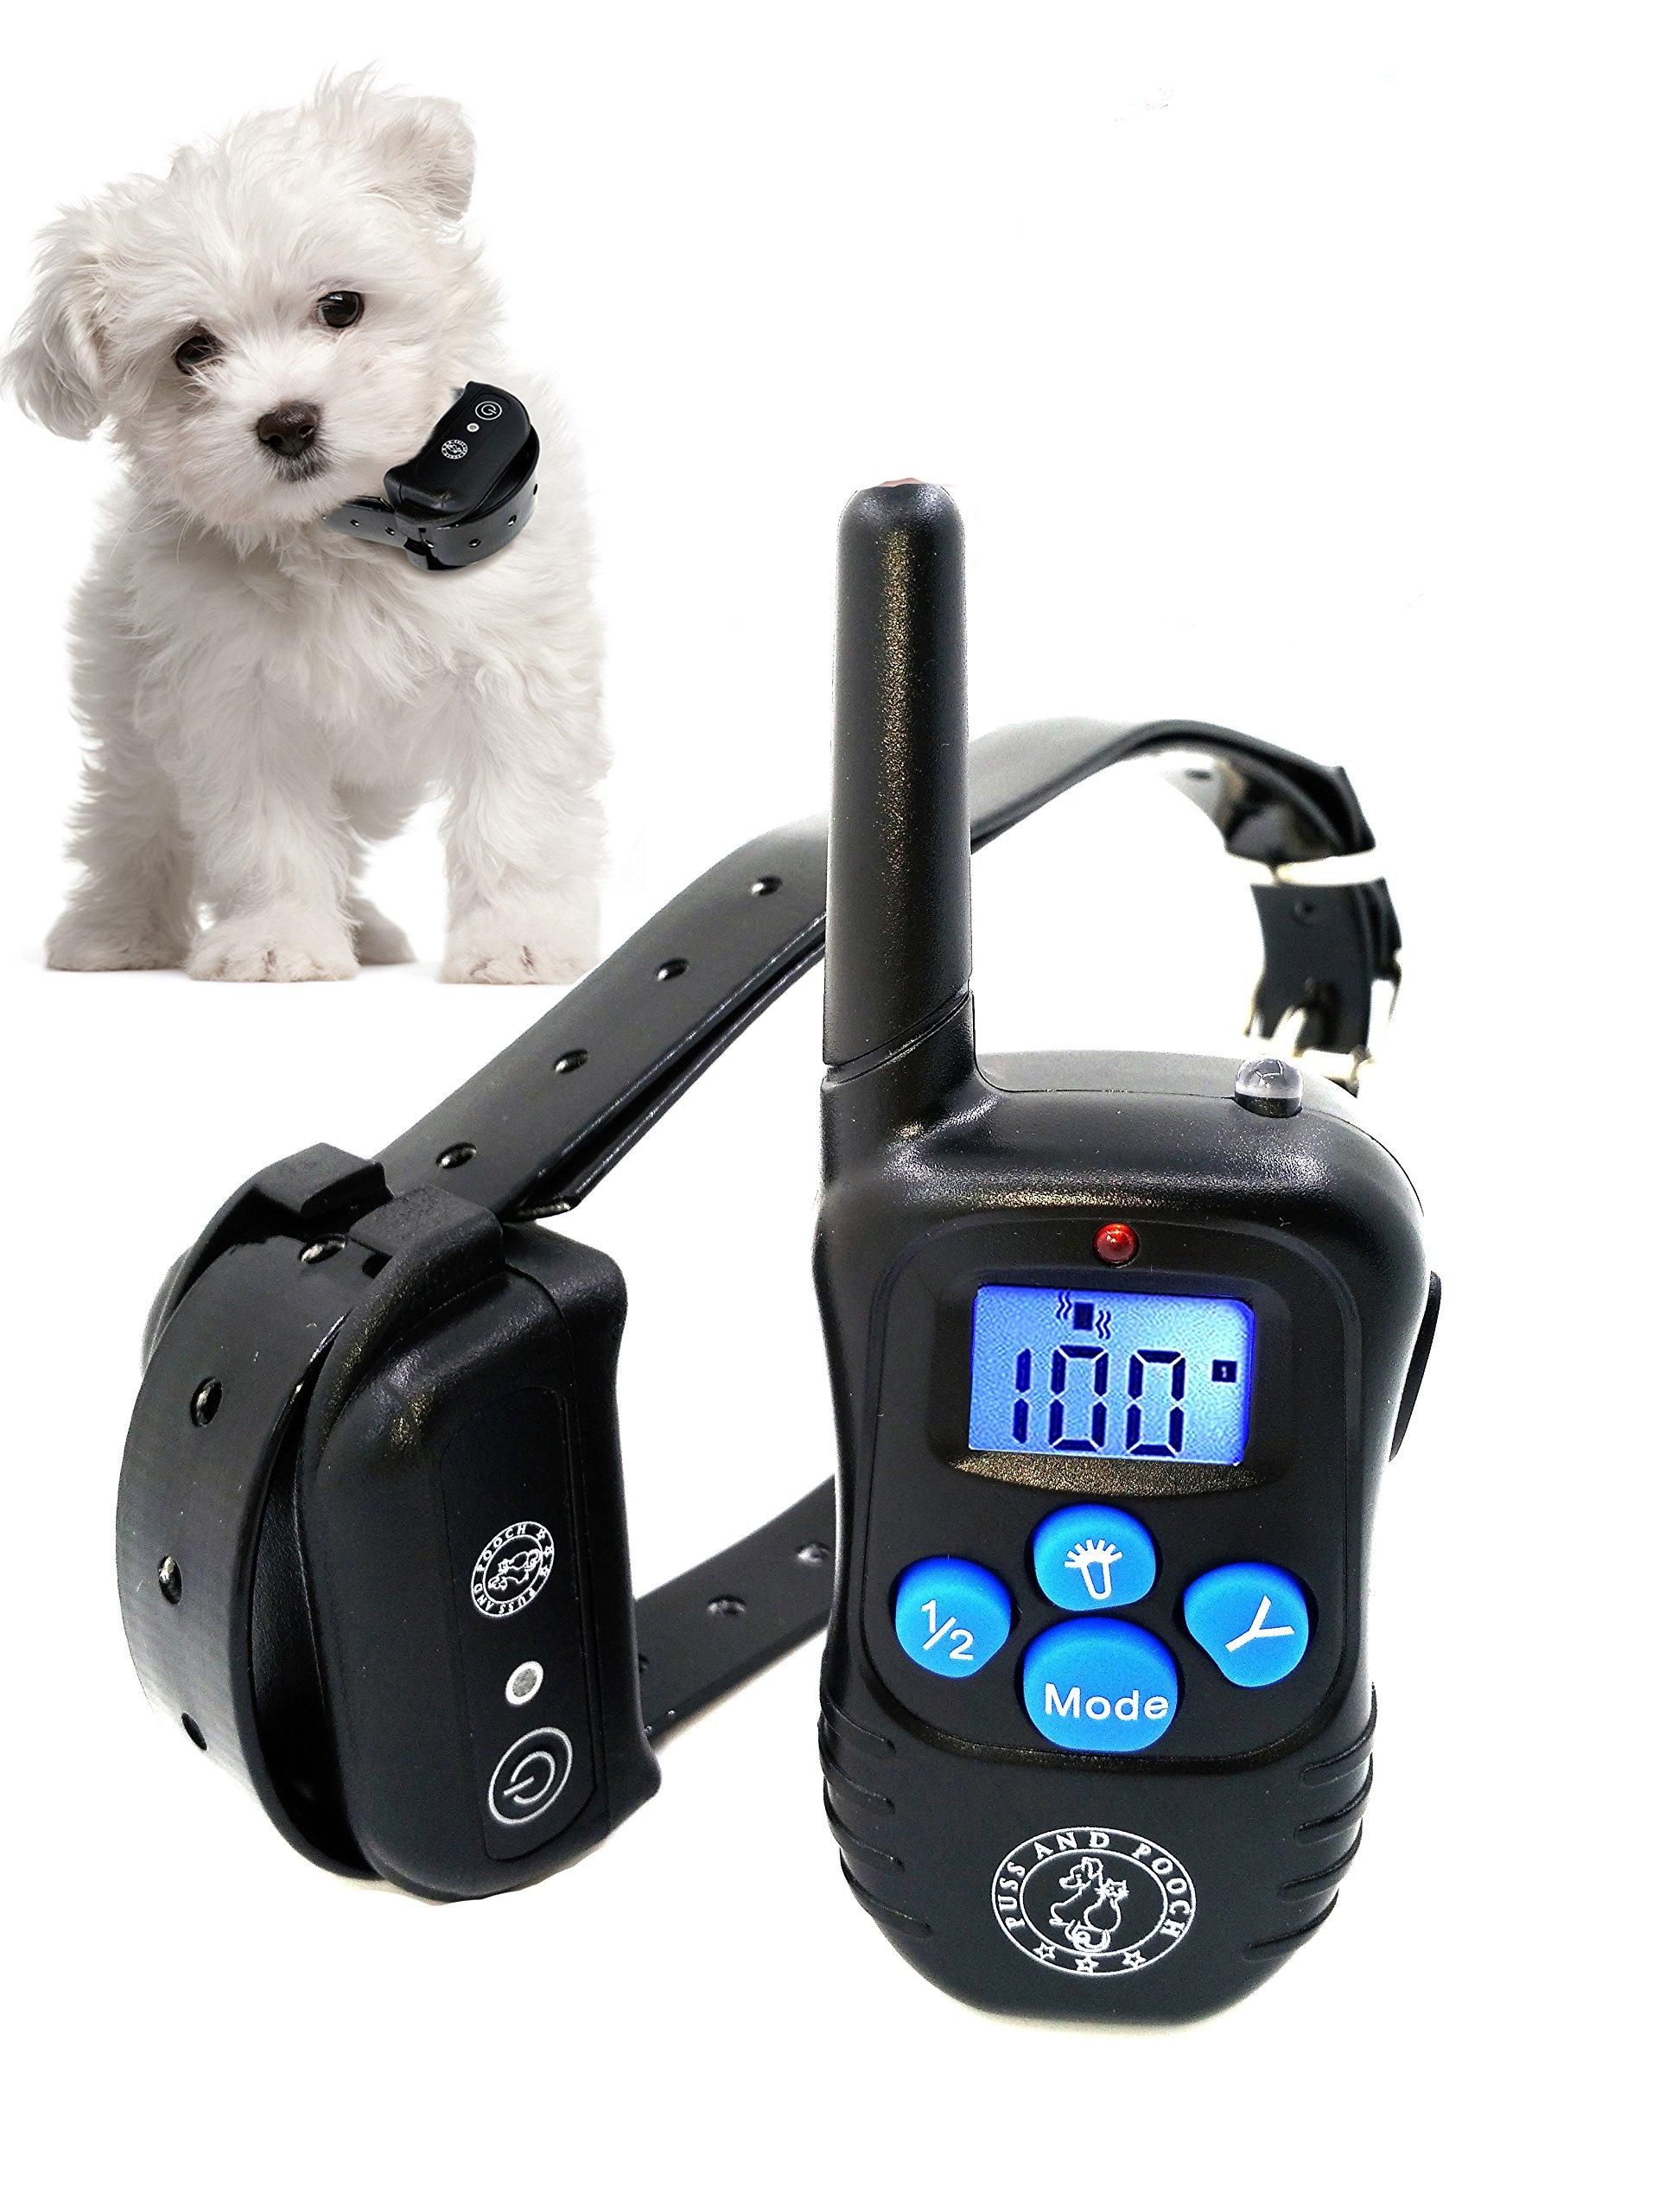 Puss and Pooch Dog Training Collar - Dog Remote Training Collar 300 Meter Range Static Shock Collar w/Humane Vibration & Beep Option